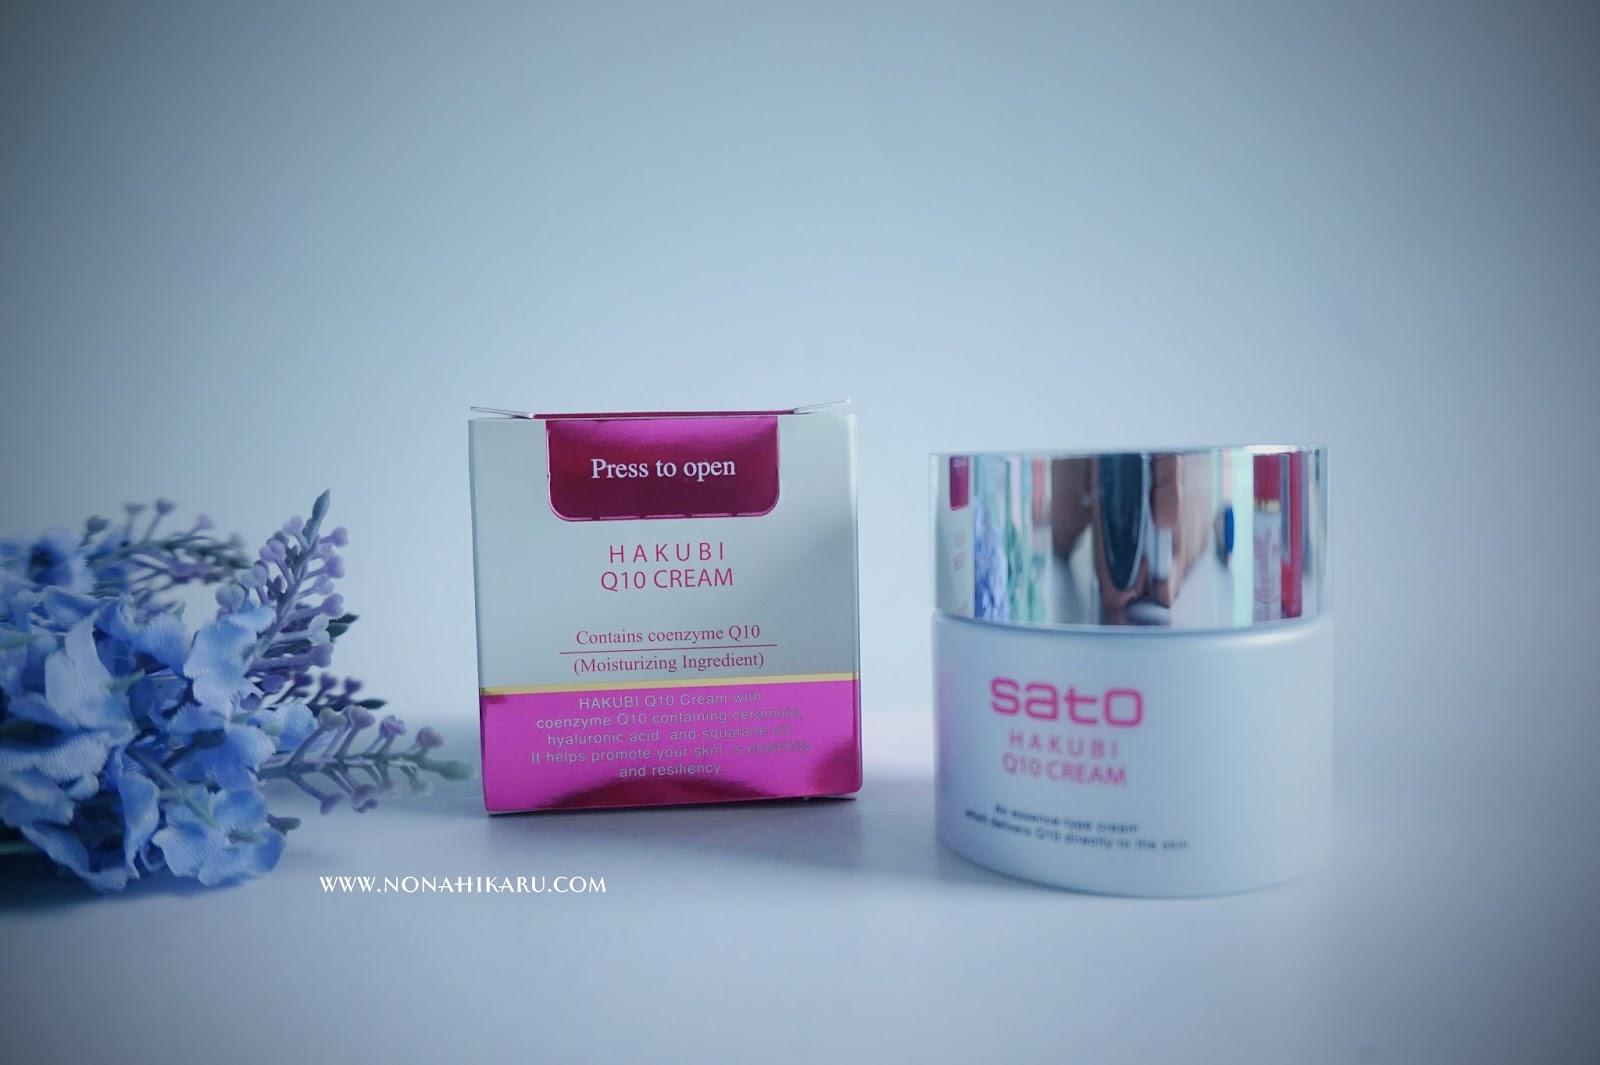 Review Hakubi Bb Cream Spf 30 Pa Beauty Travelling Sato Pastaron Produk Lainnya Dari Pharmaceutical Adalah Q10 Yang Mempunyai Tiga Kandungan Untuk Kesehatan Kulit